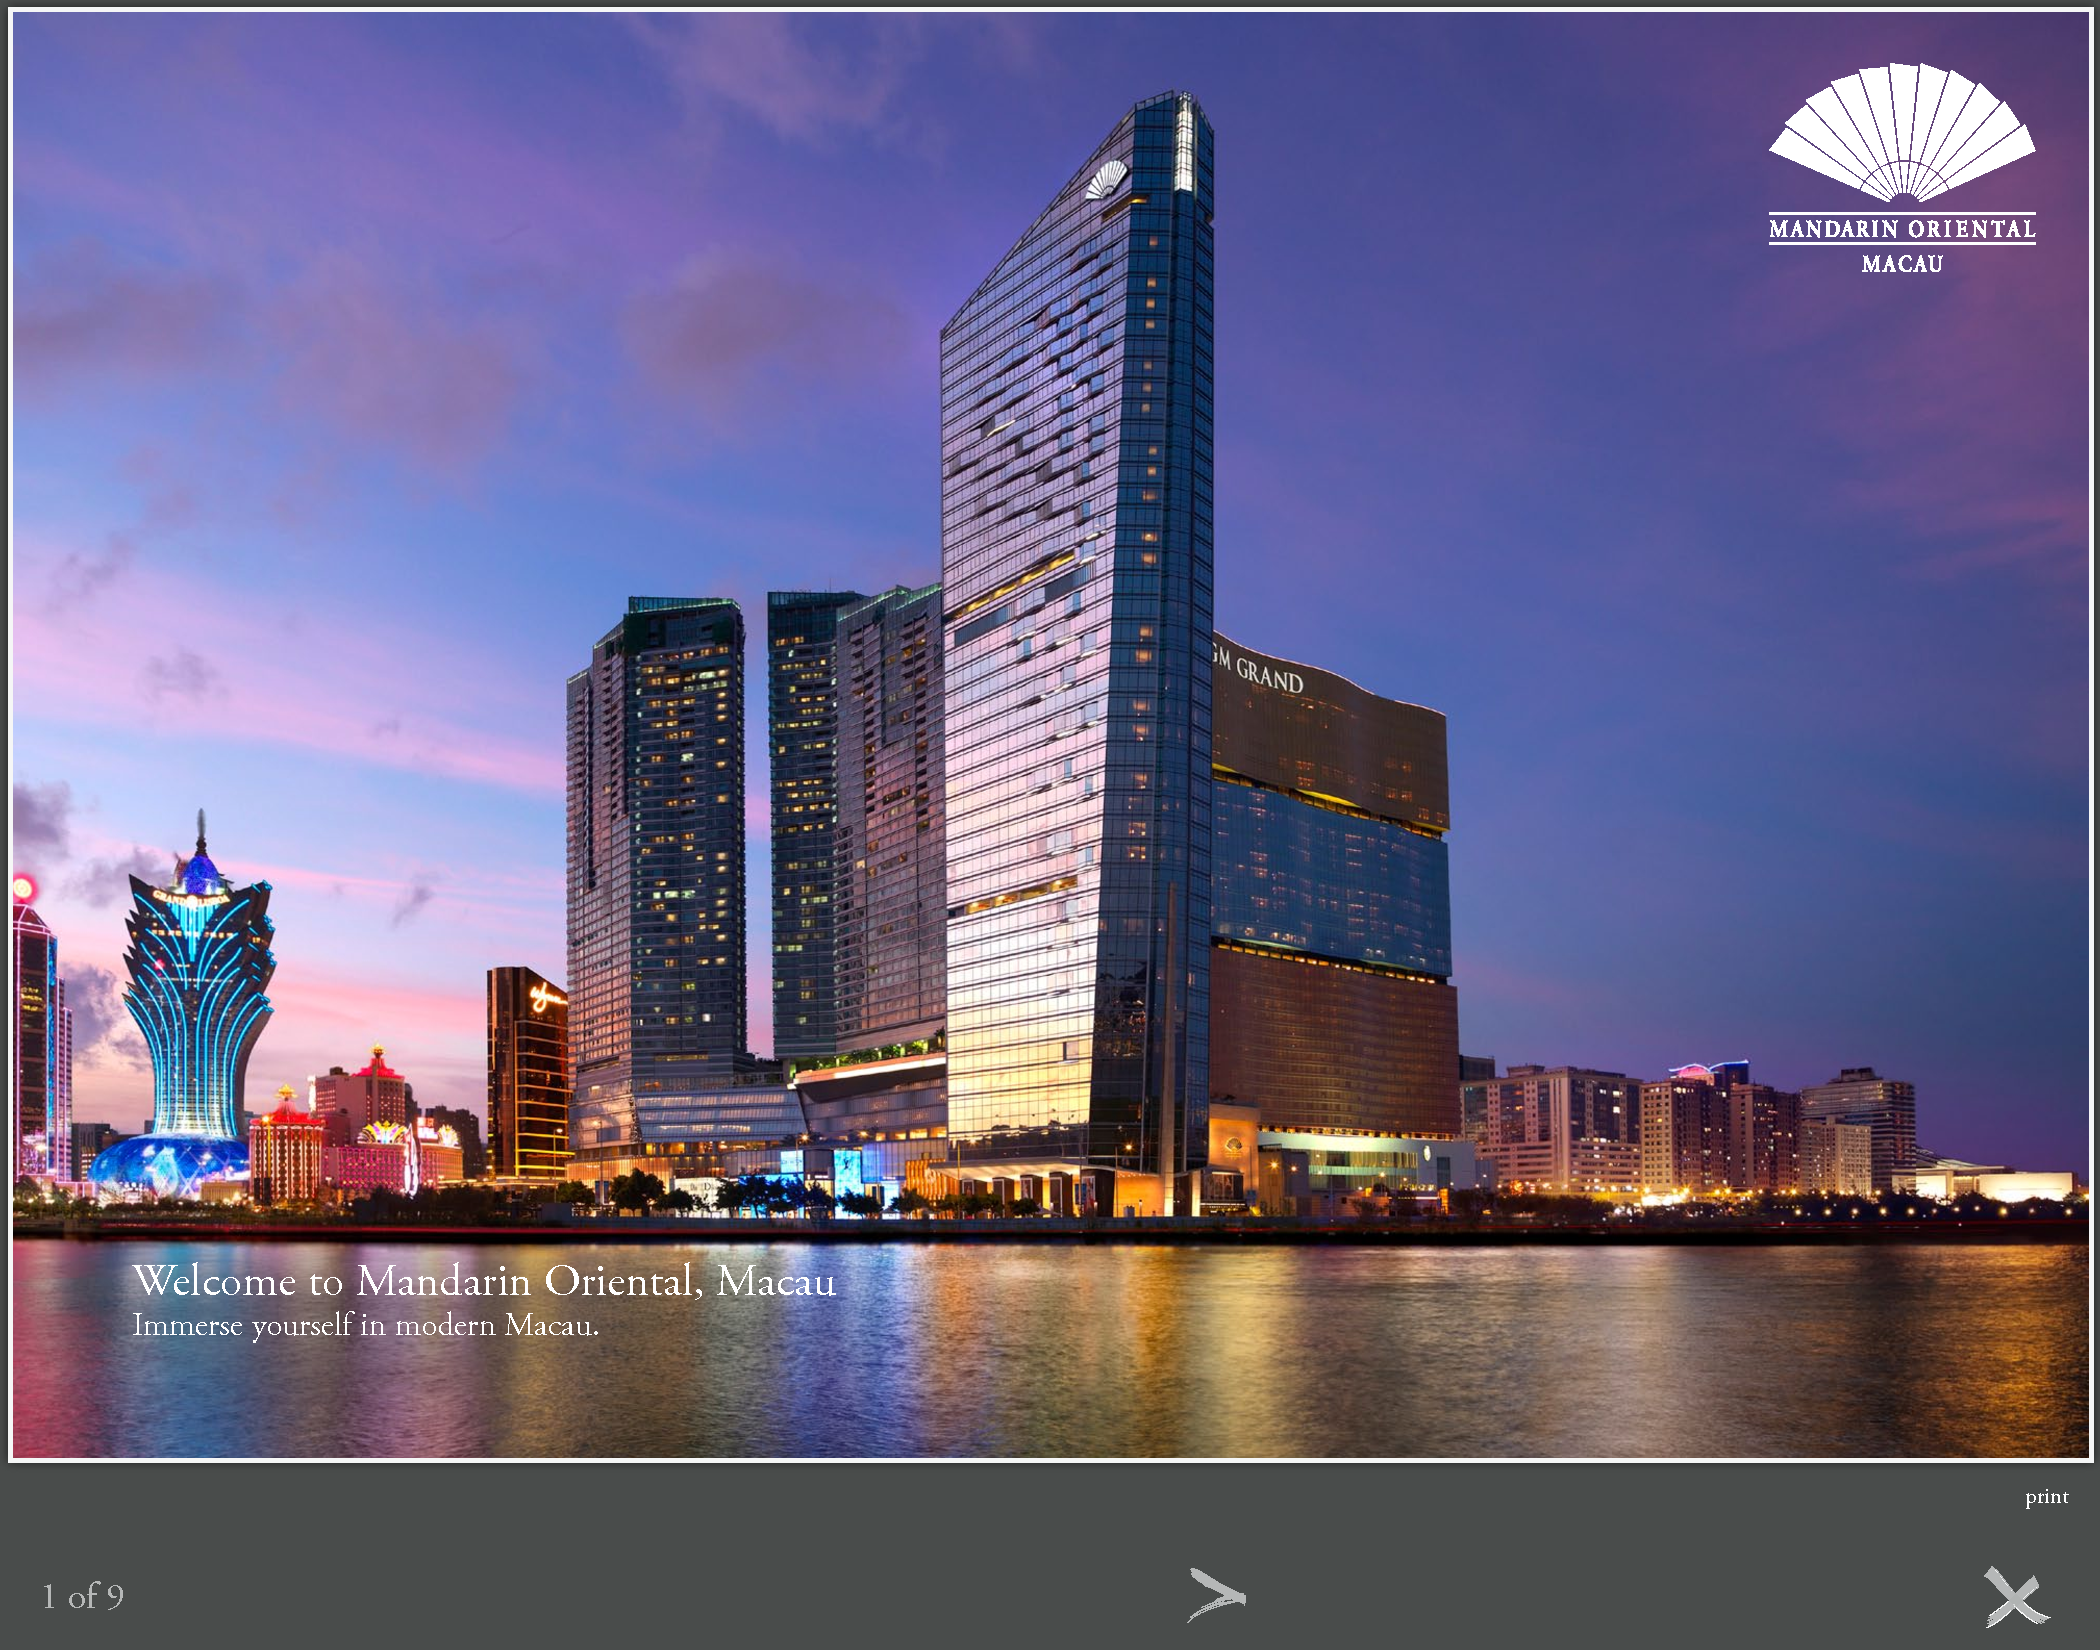 Macau (Chine) : Célébrations du Nouvel An chinois au Mandarin Oriental…